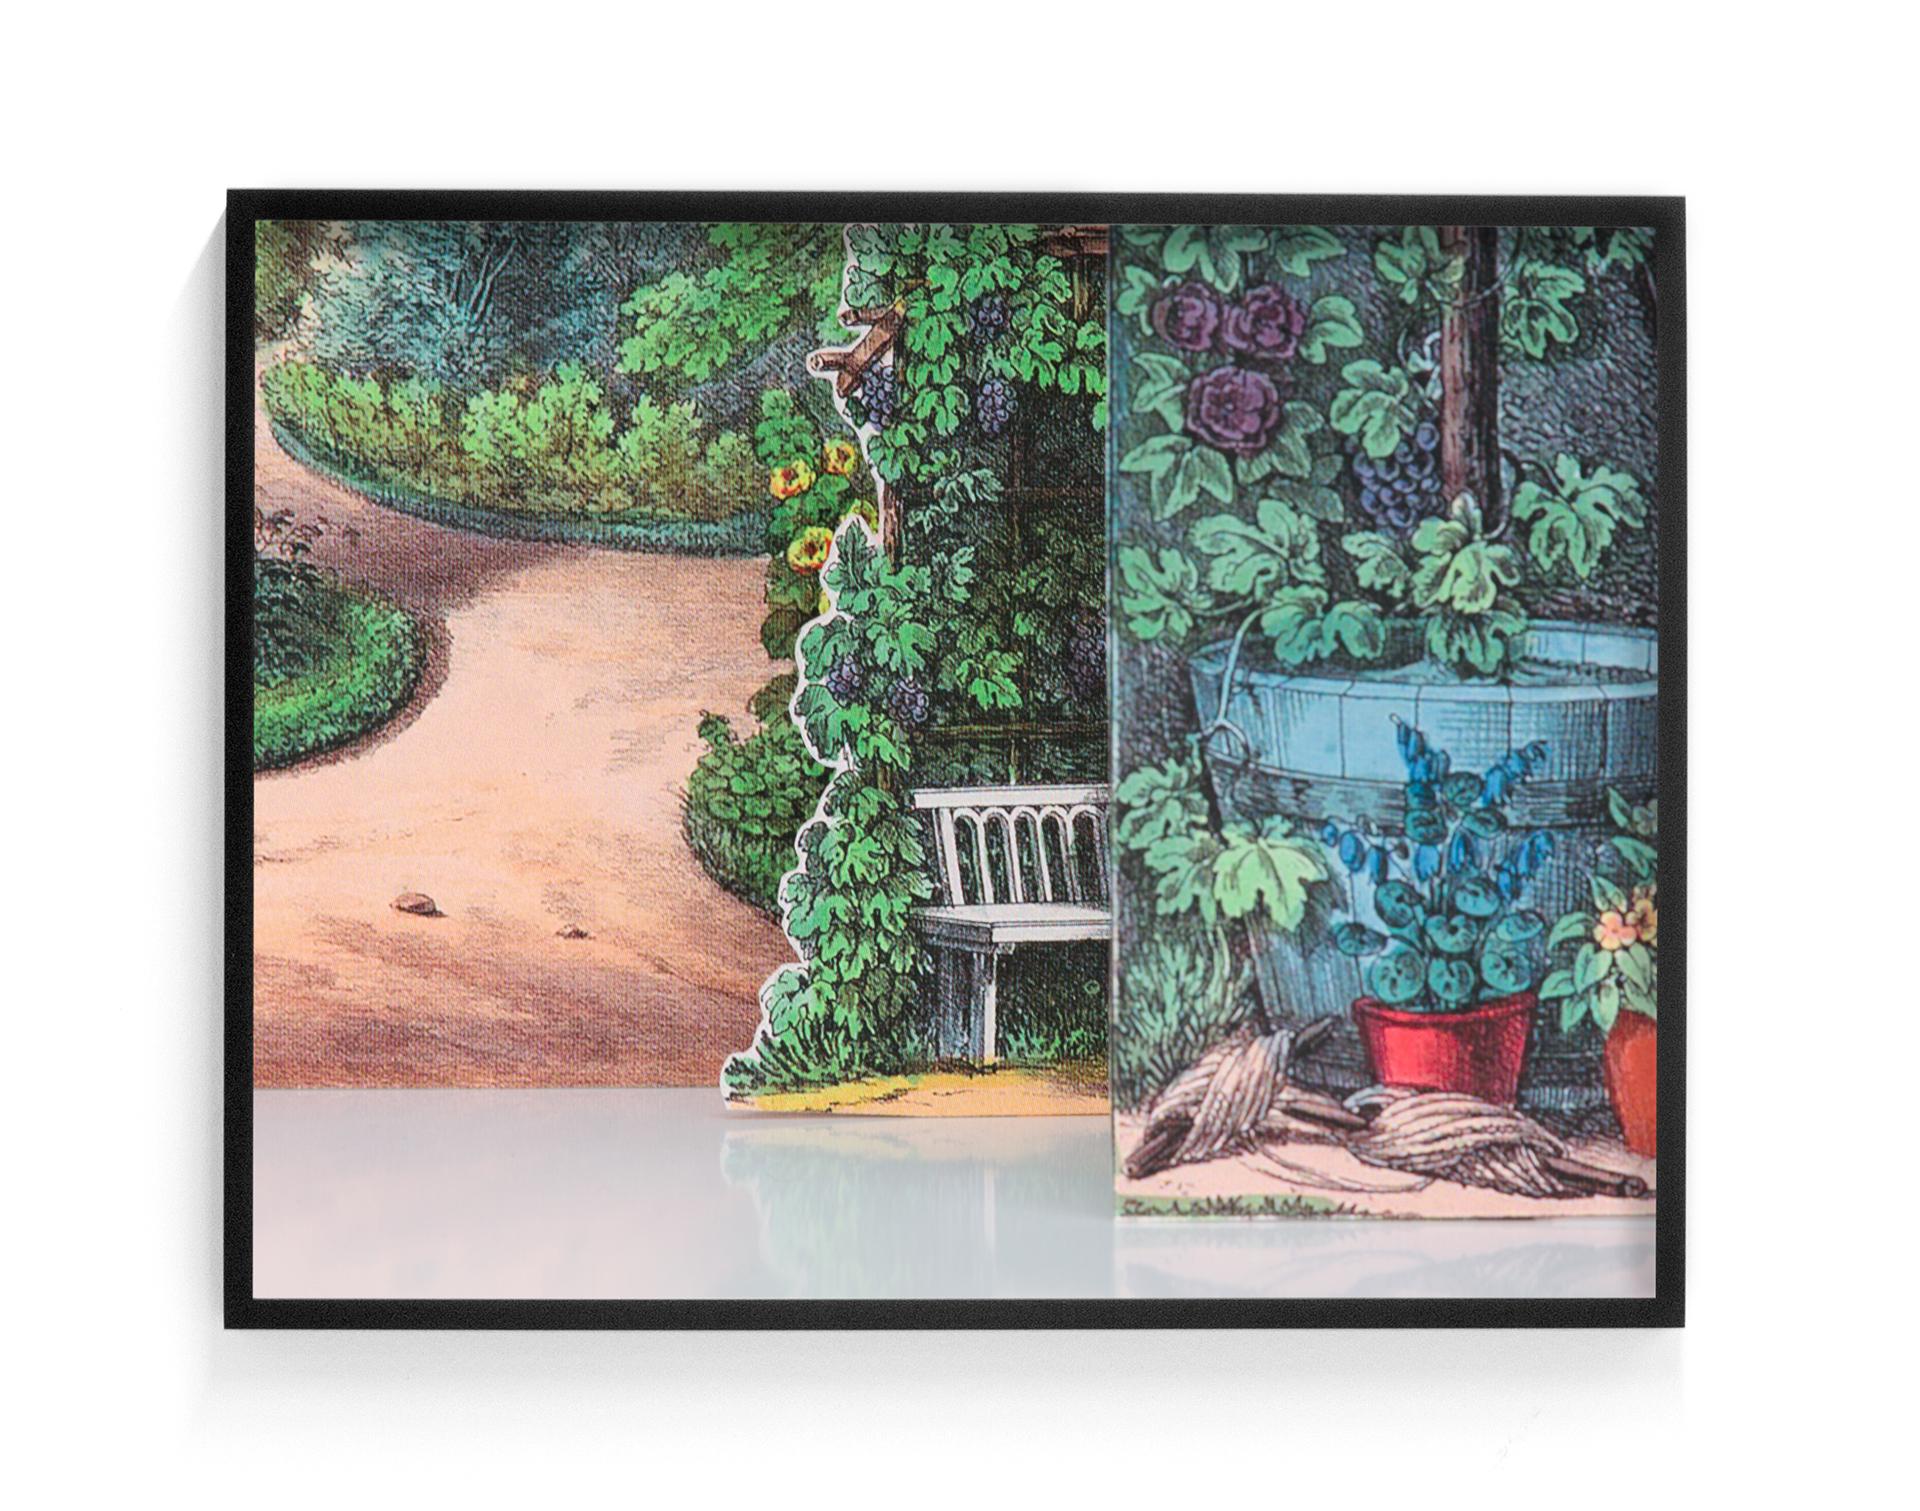 Elizabeth Corkery, Garten Versatzstucke, 2017, Archival digital print, 18